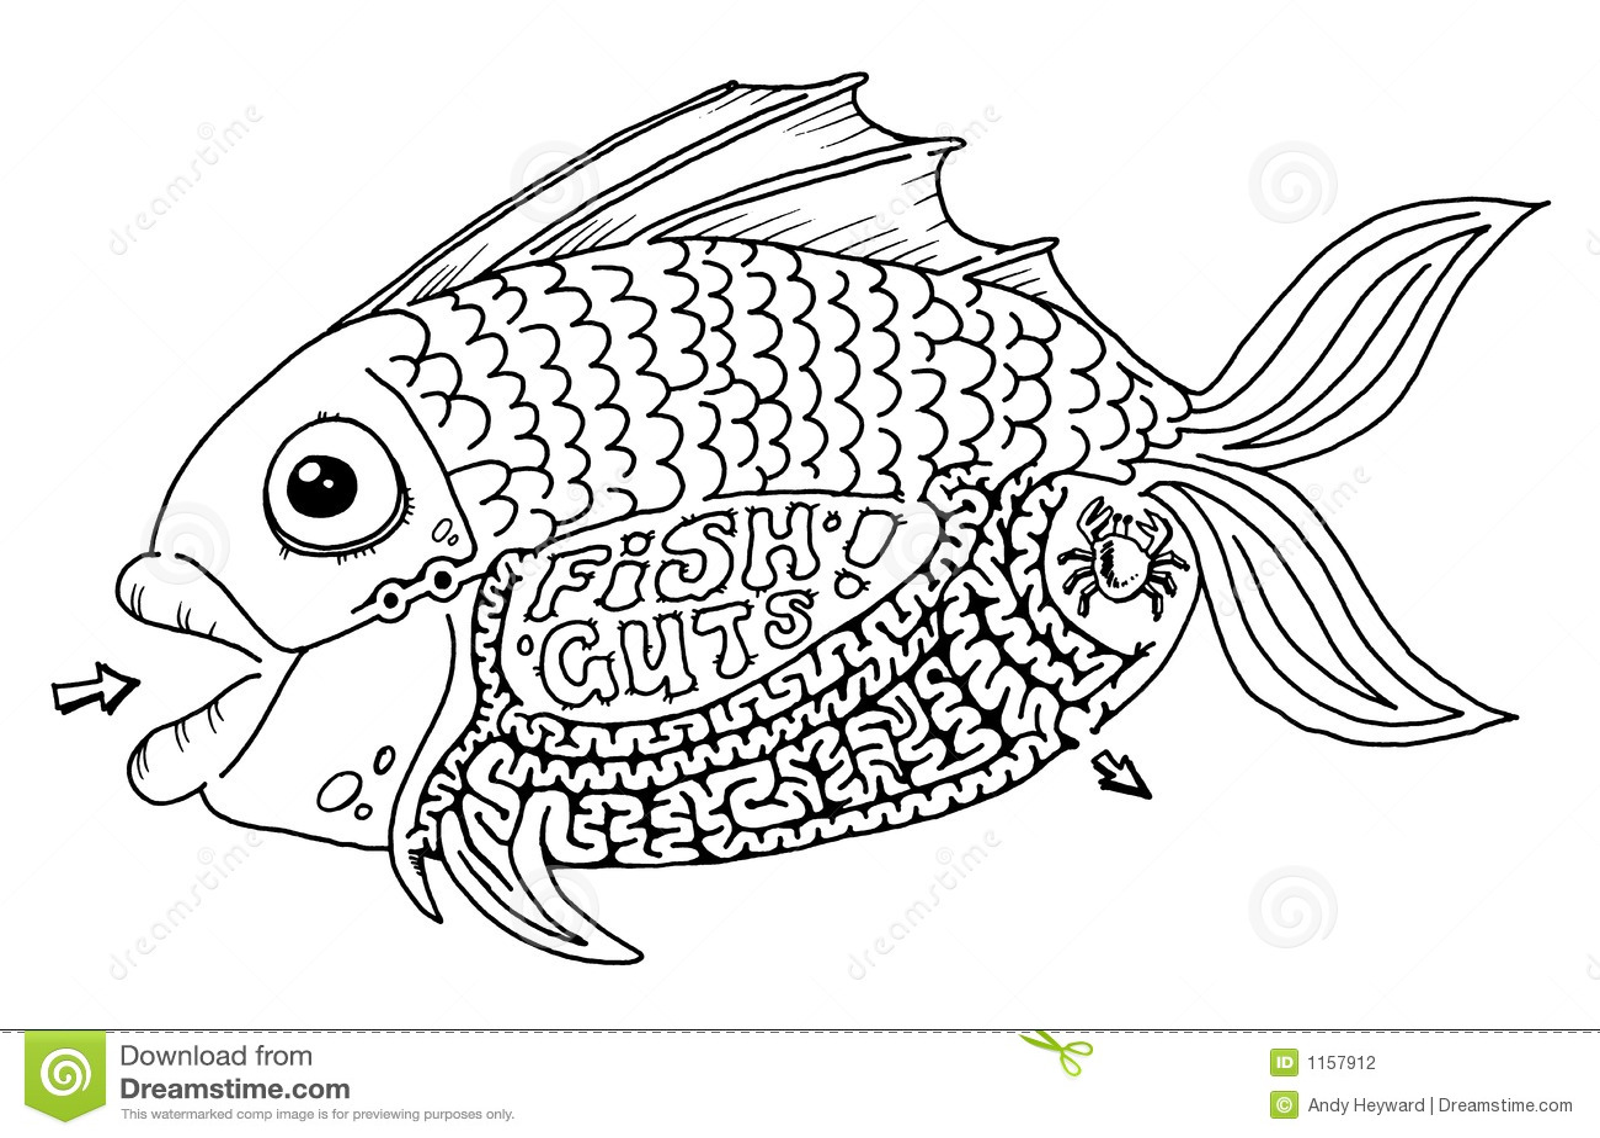 fish-guts-maze-1157912...